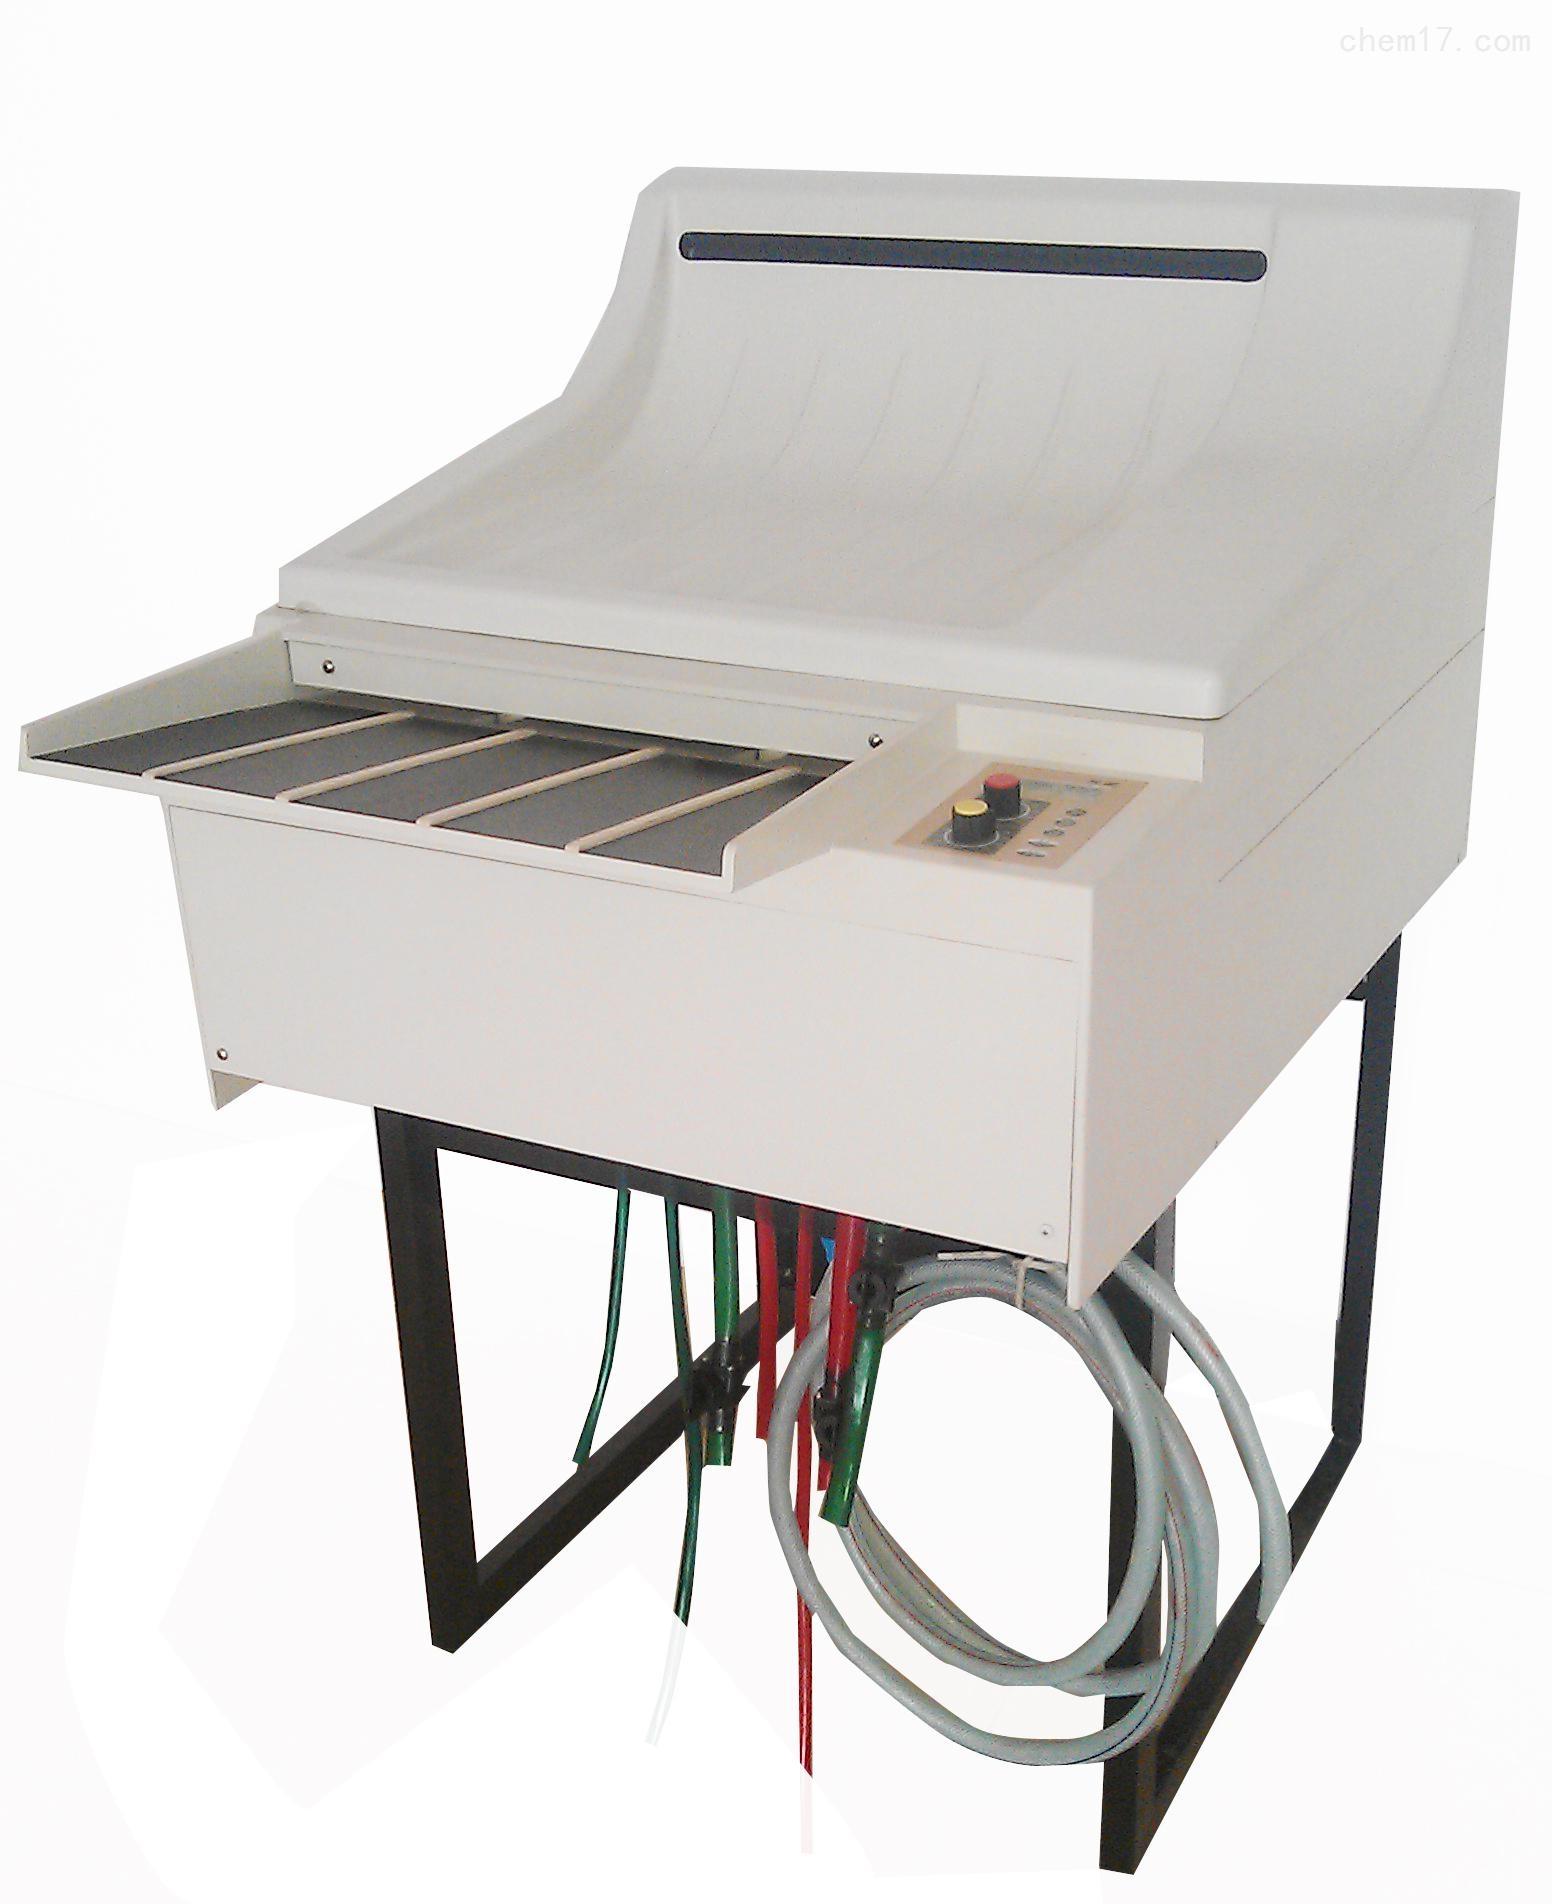 X射线探伤用工业底片洗片机